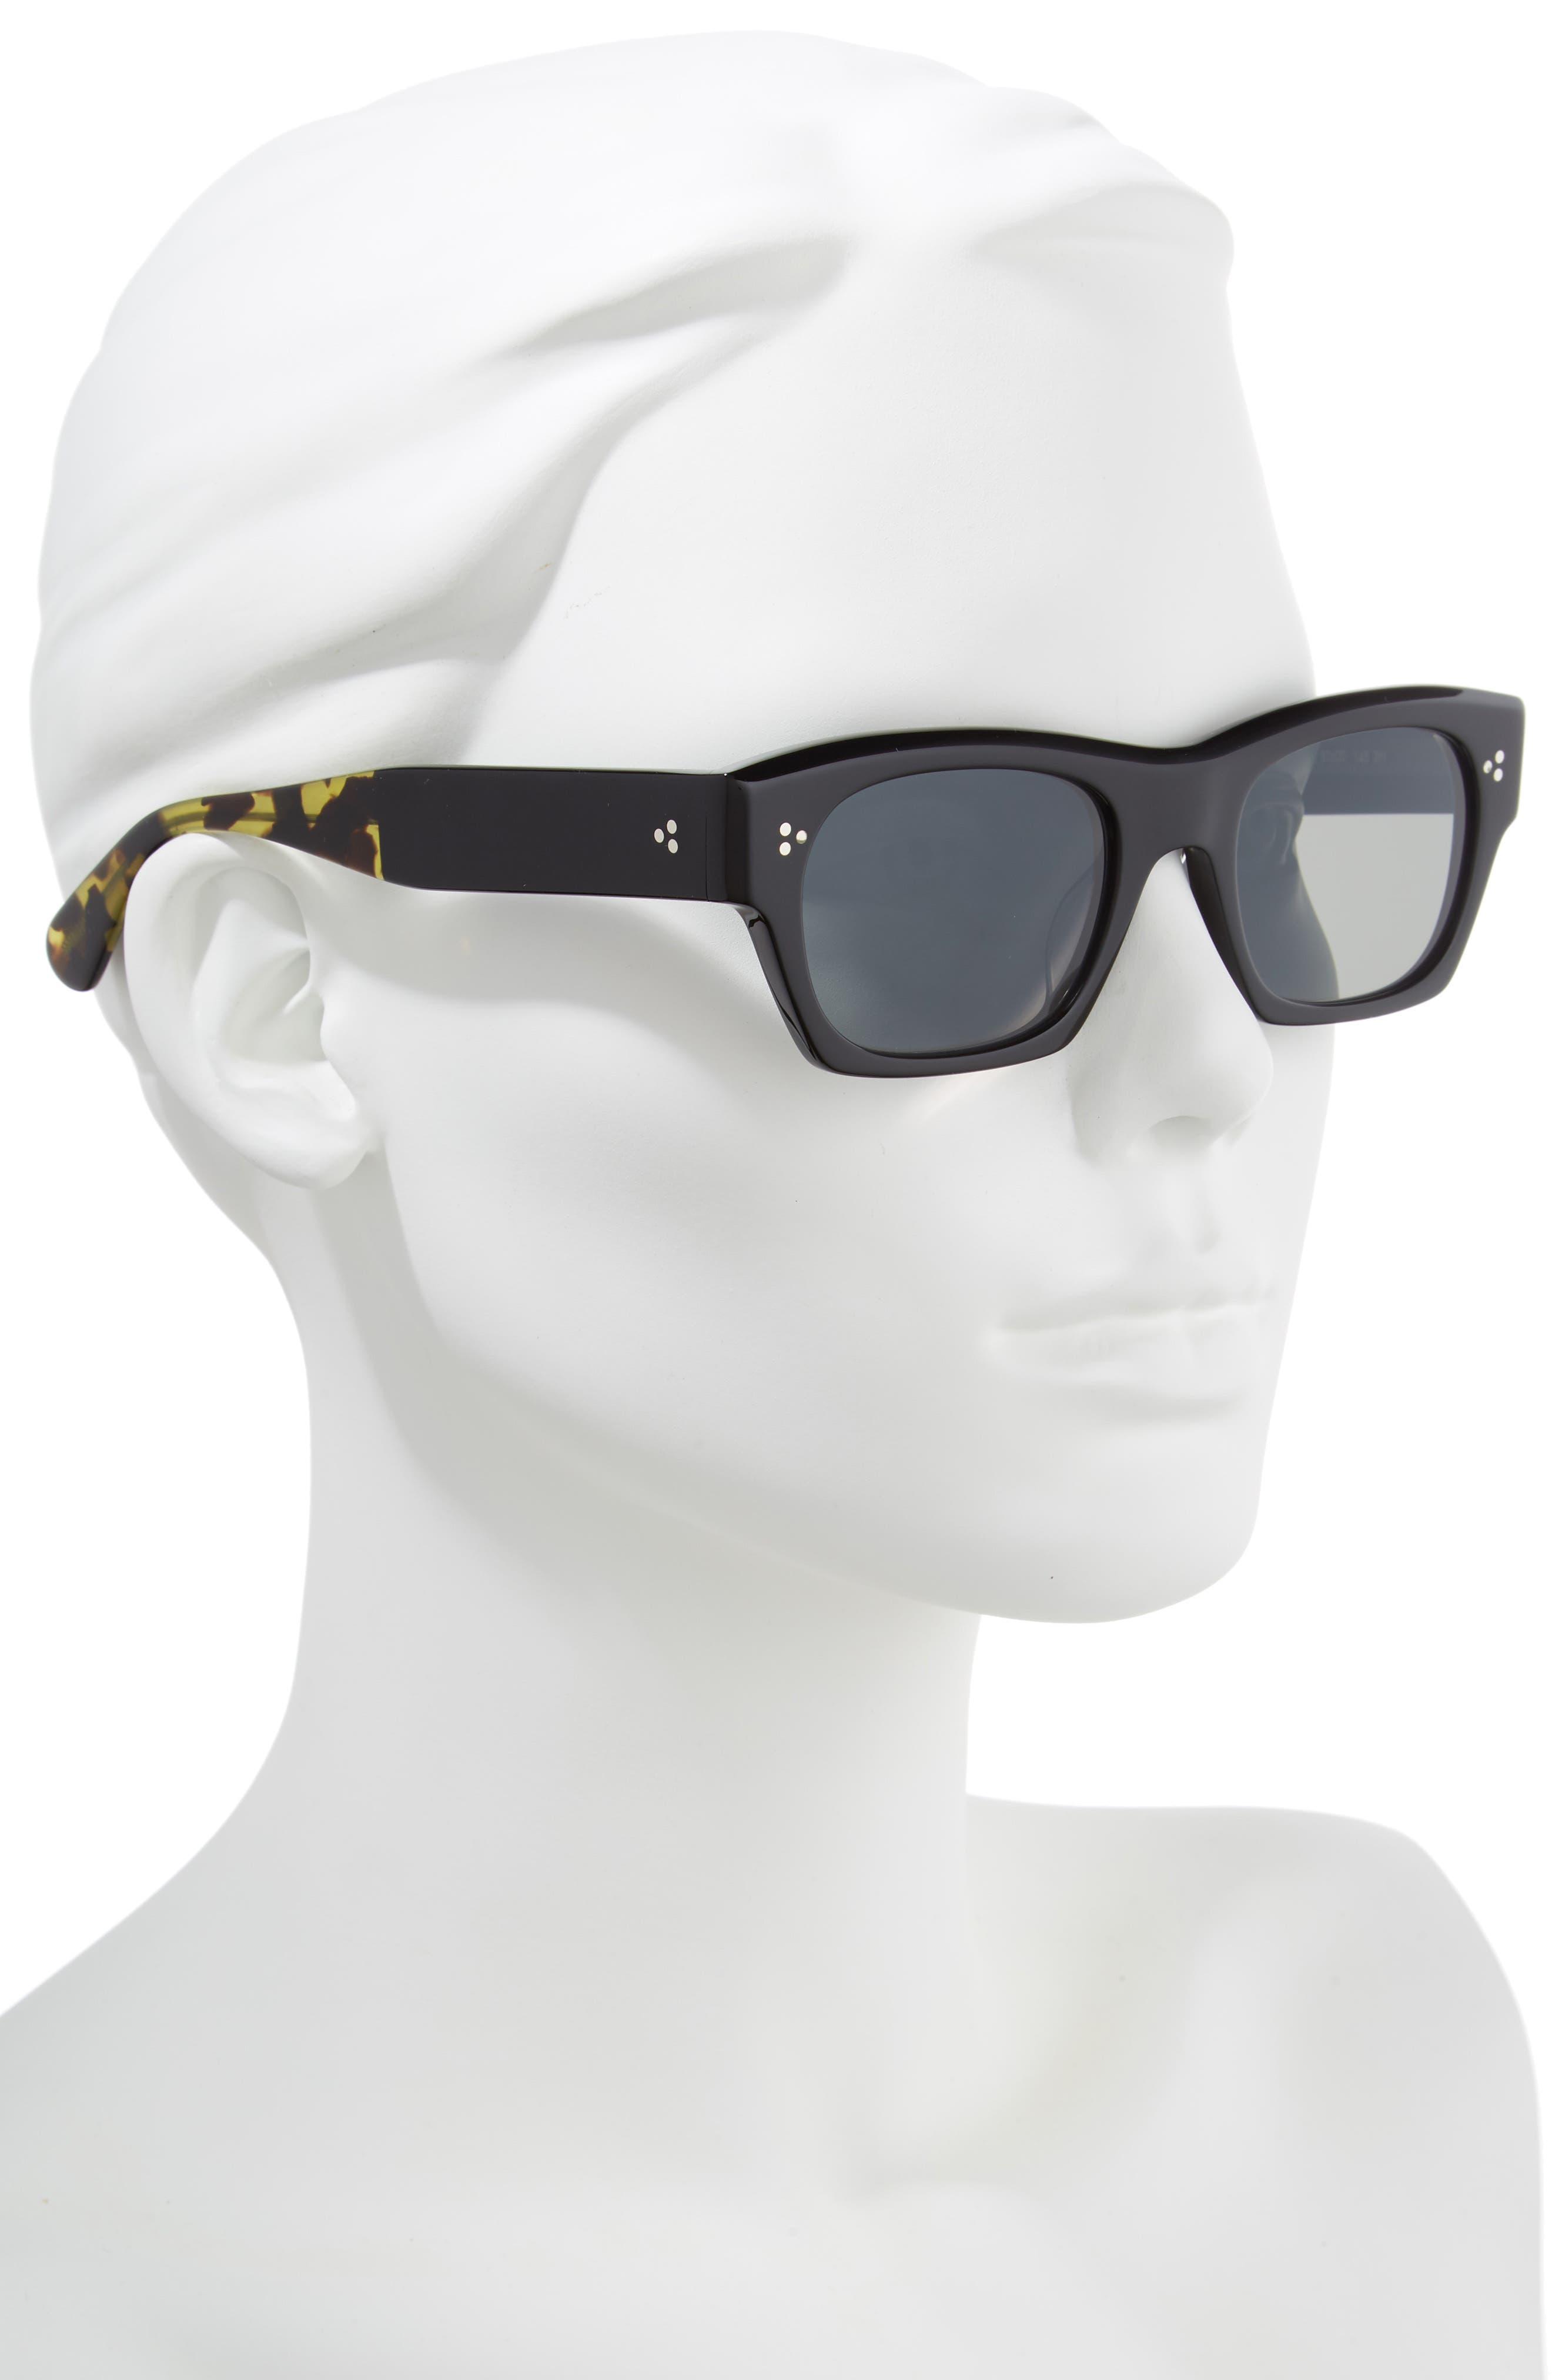 Isba 51mm Sunglasses,                             Alternate thumbnail 2, color,                             BLACK